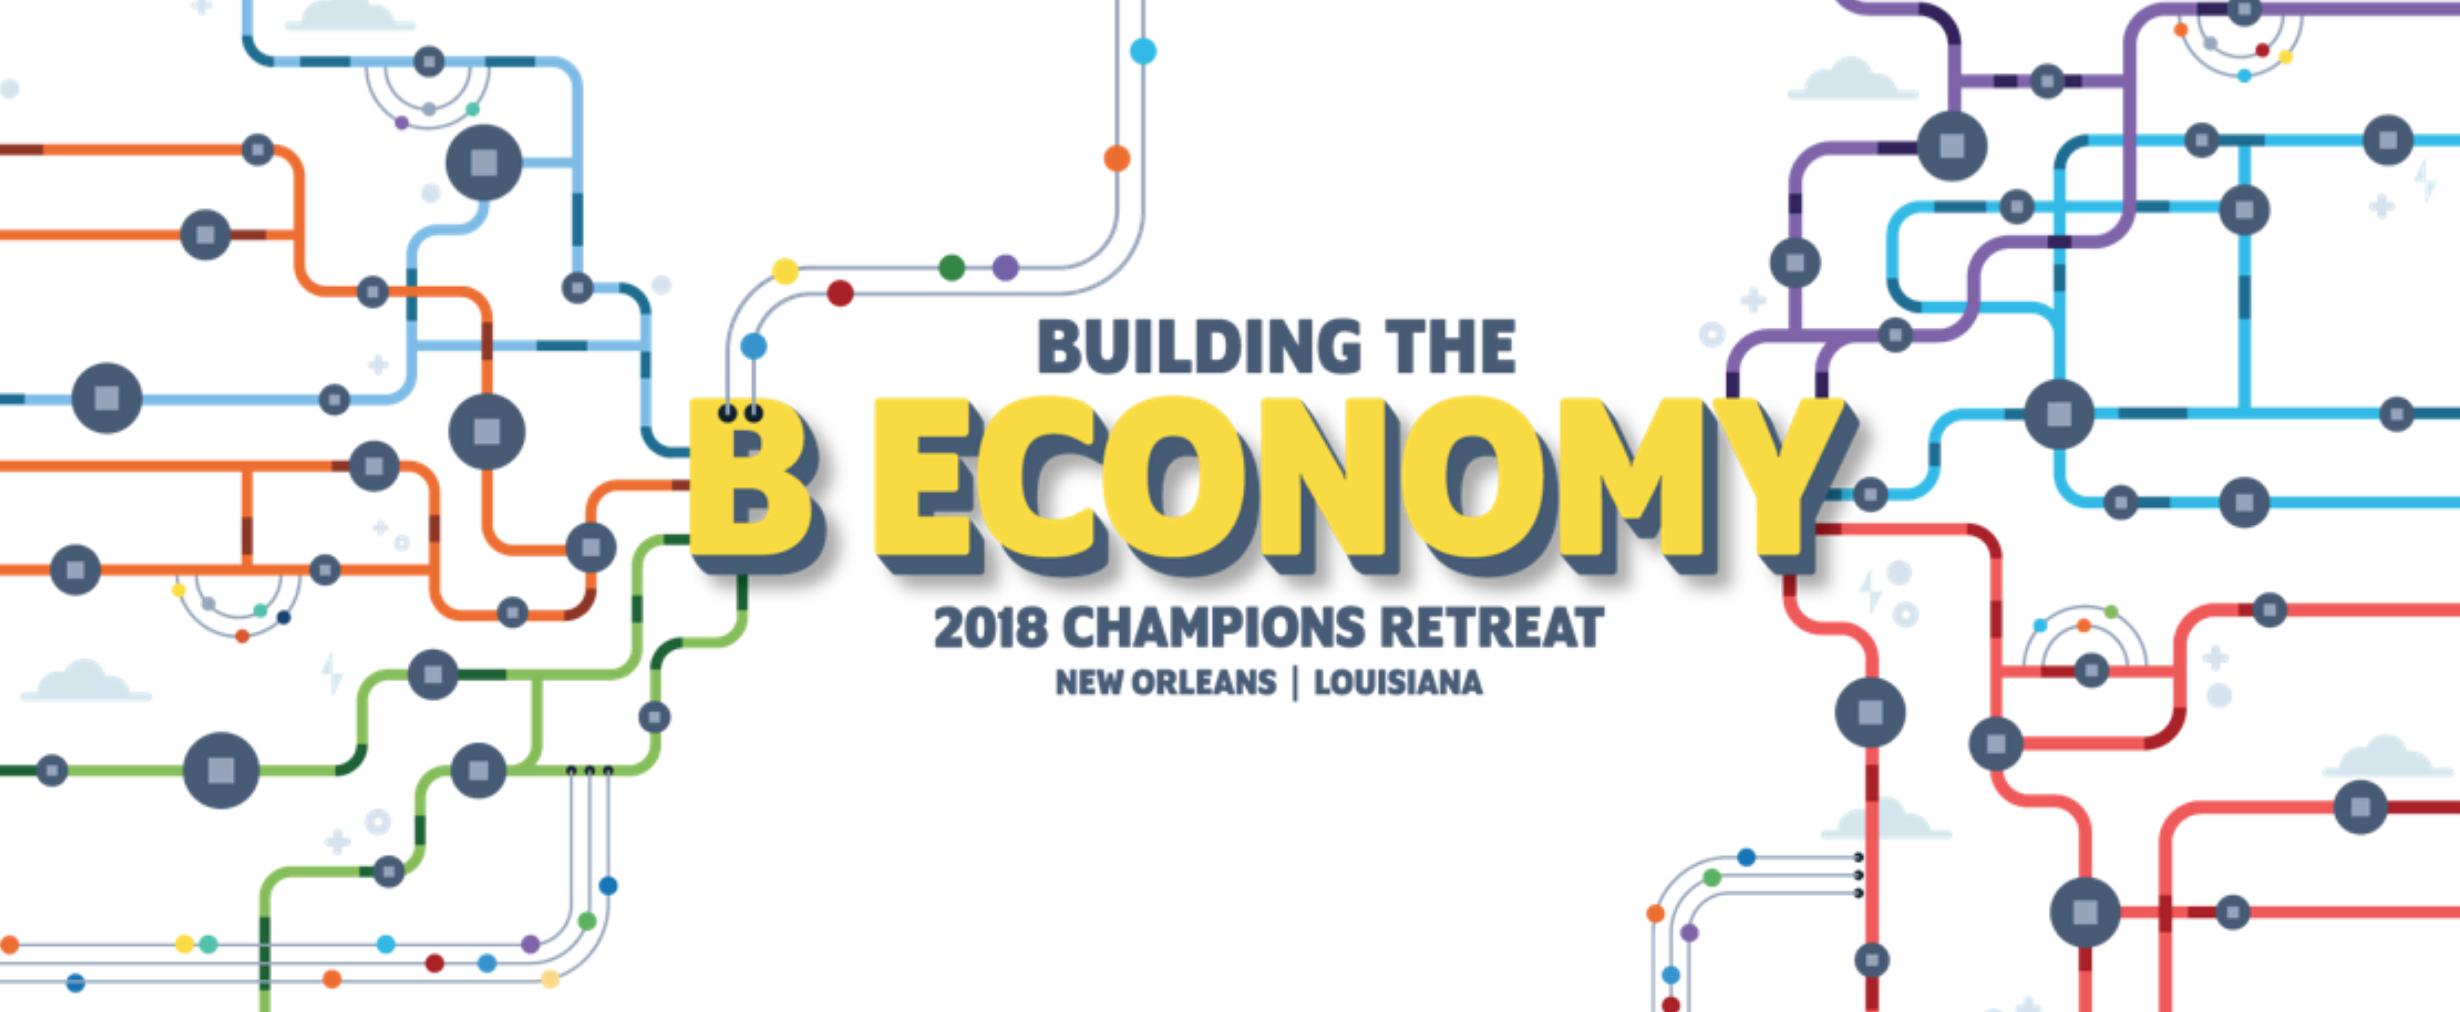 building-the-b-economy-b-corp-champions-retreat-2018.png